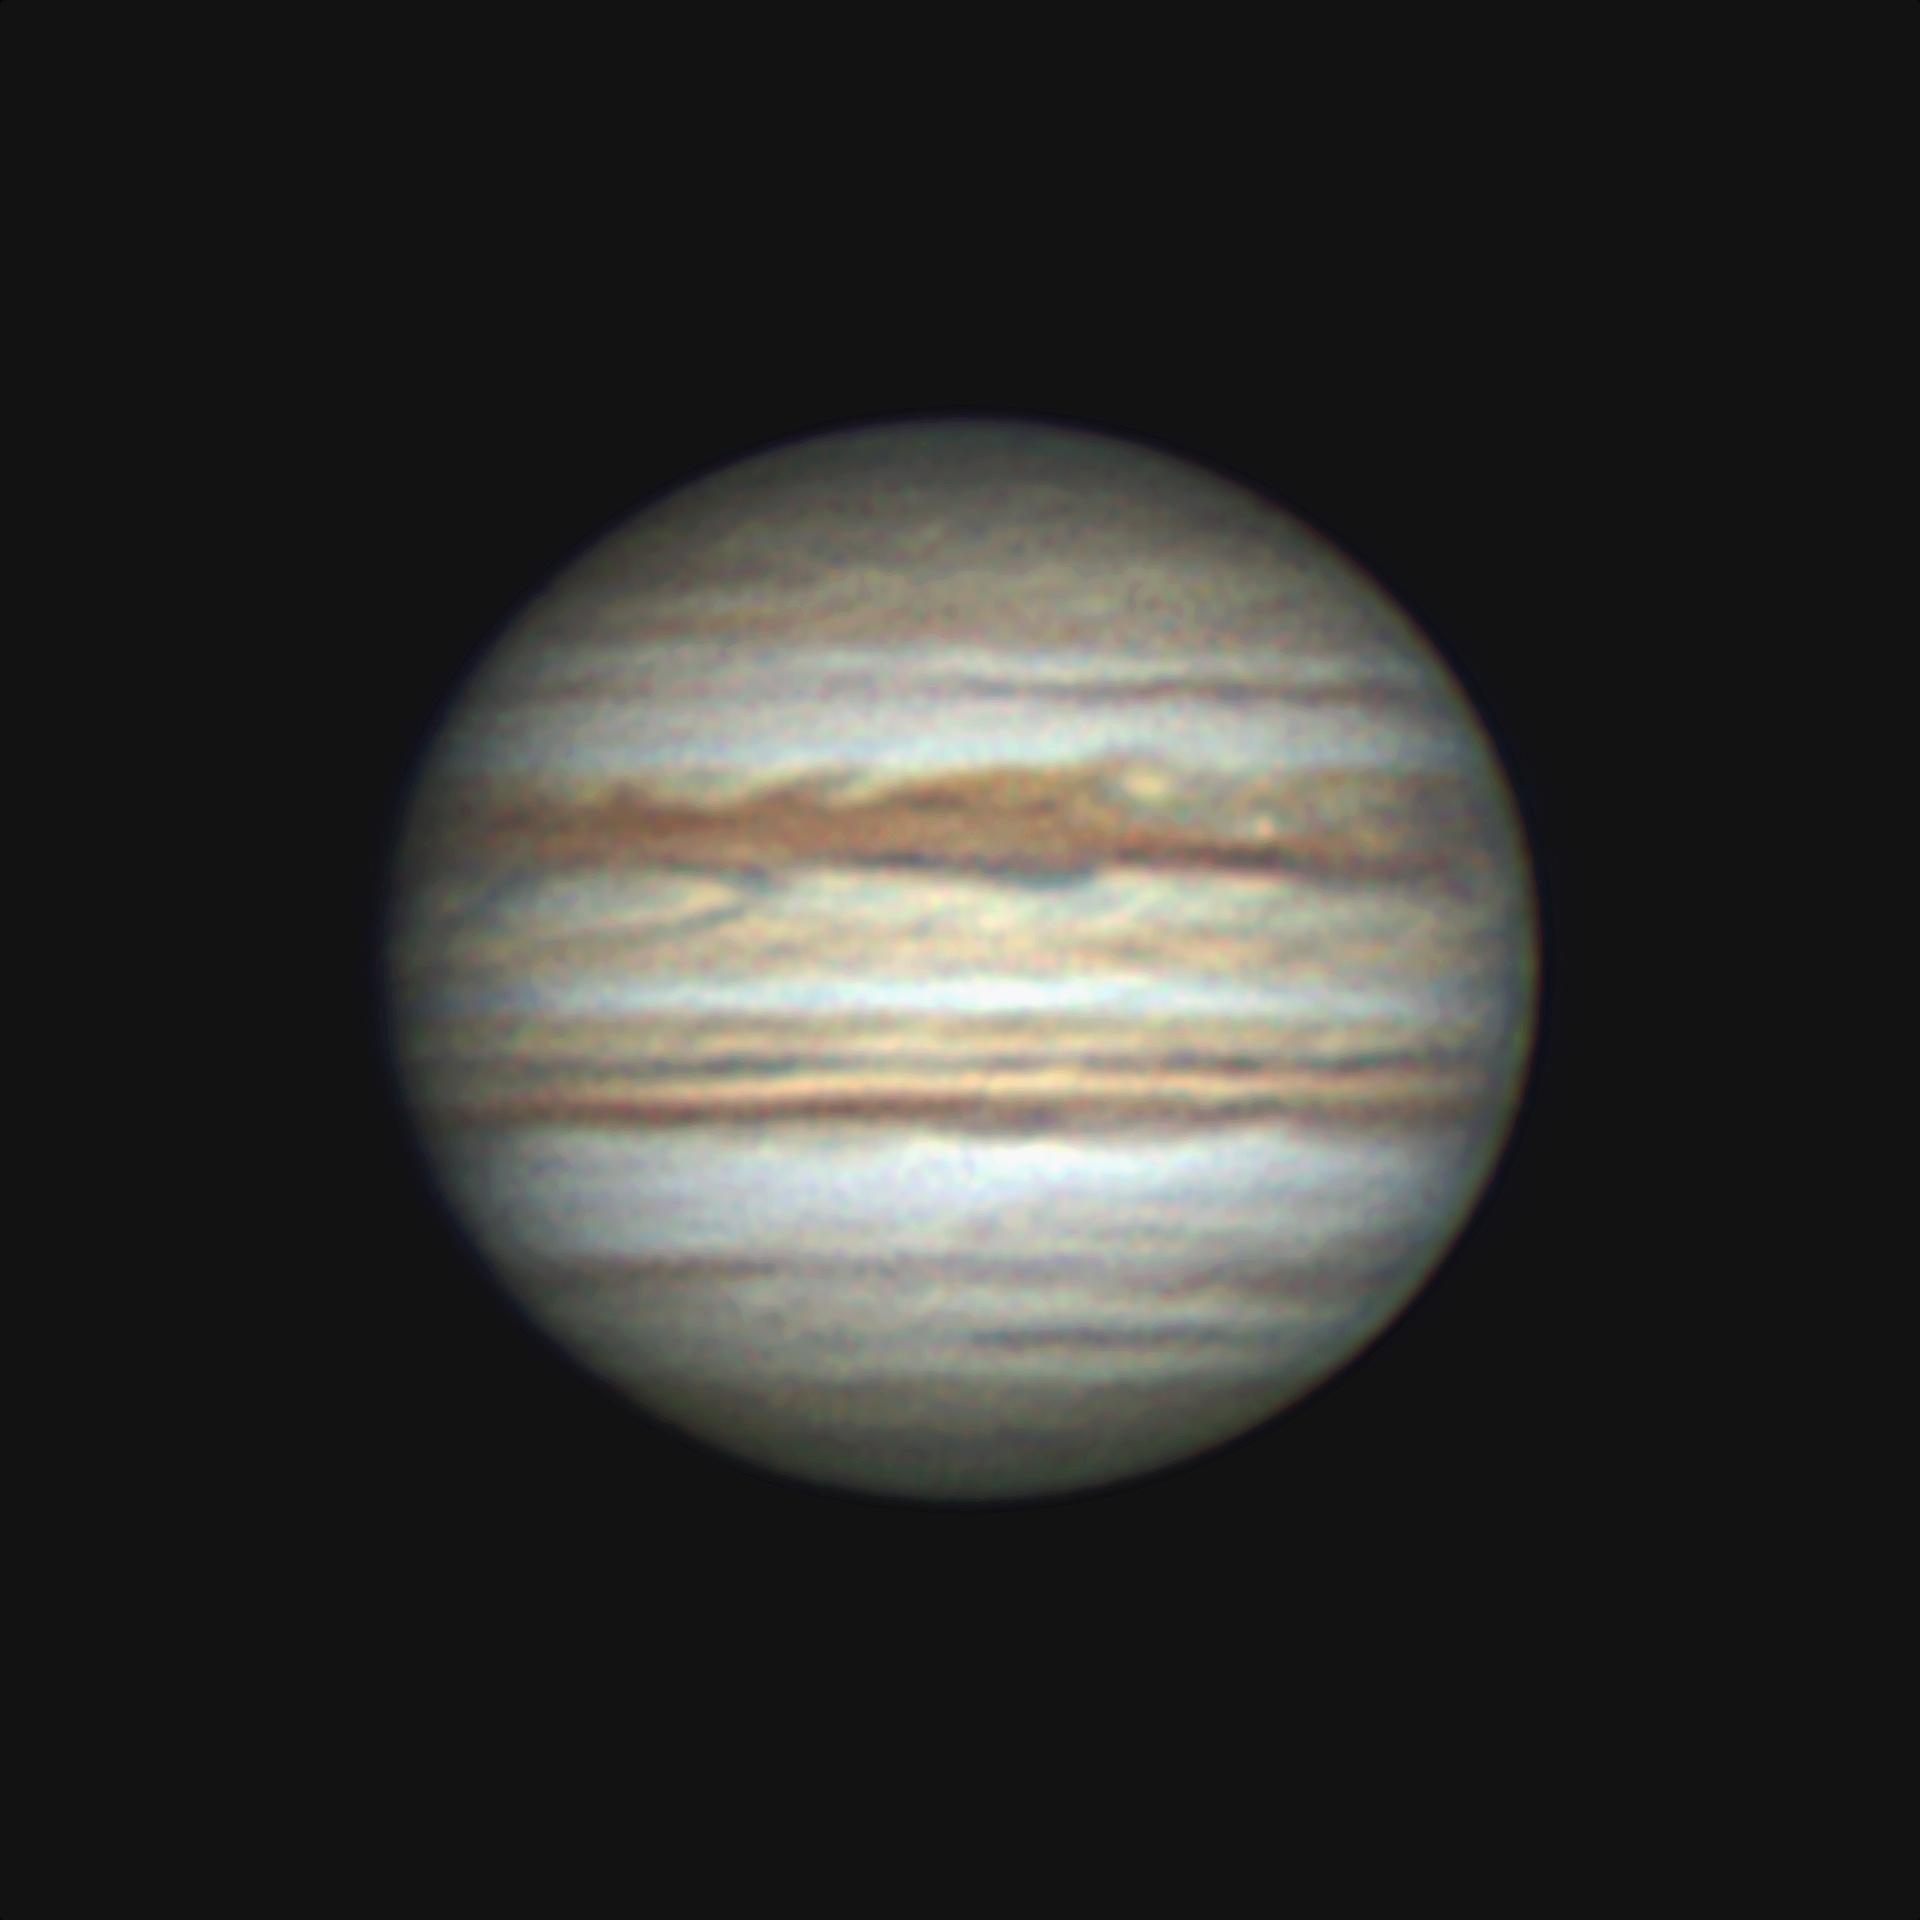 2020-07-29-2130_4-derot-RGB.png.73c996bcc87dea9ac4346ca4f8295408.png